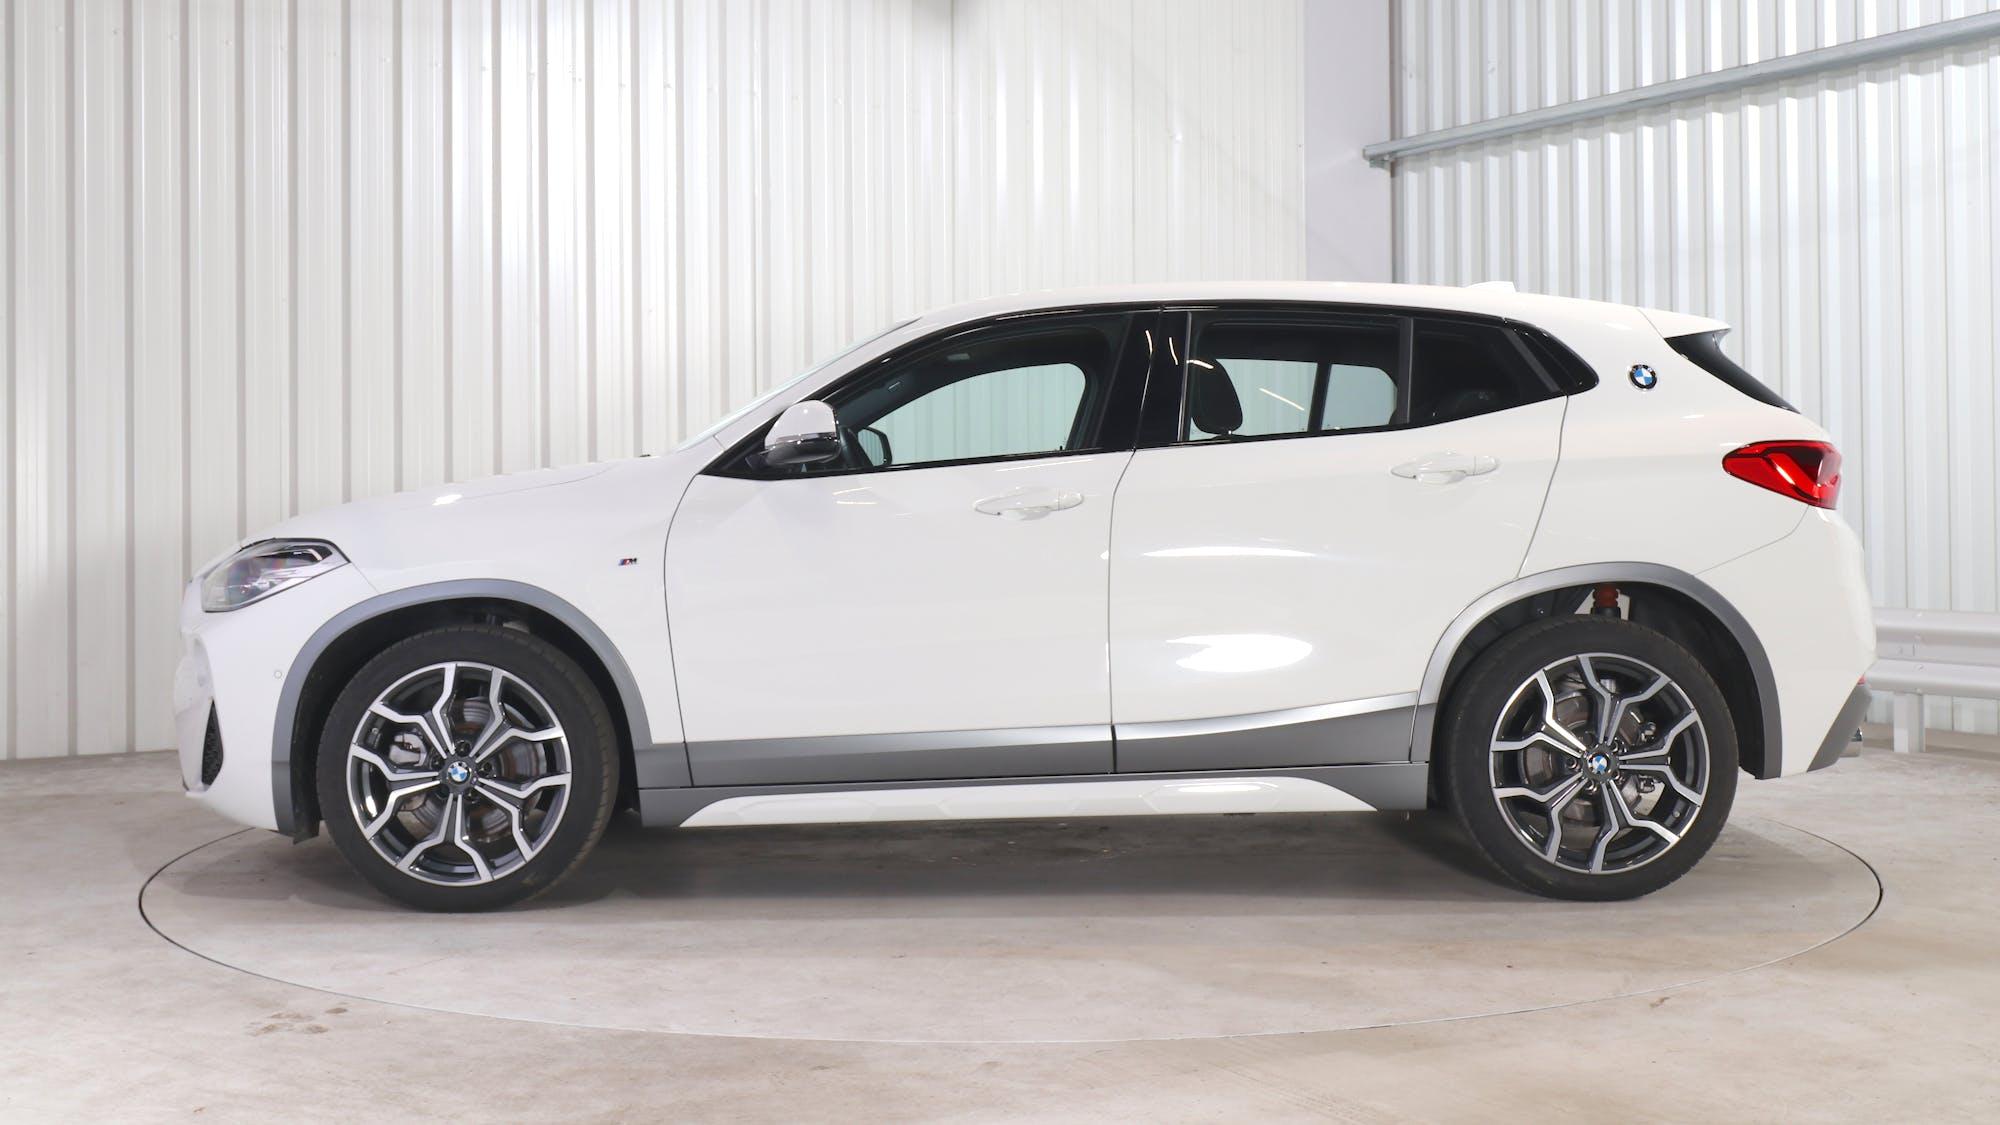 BMW X2 (F39) leasing exterior 2